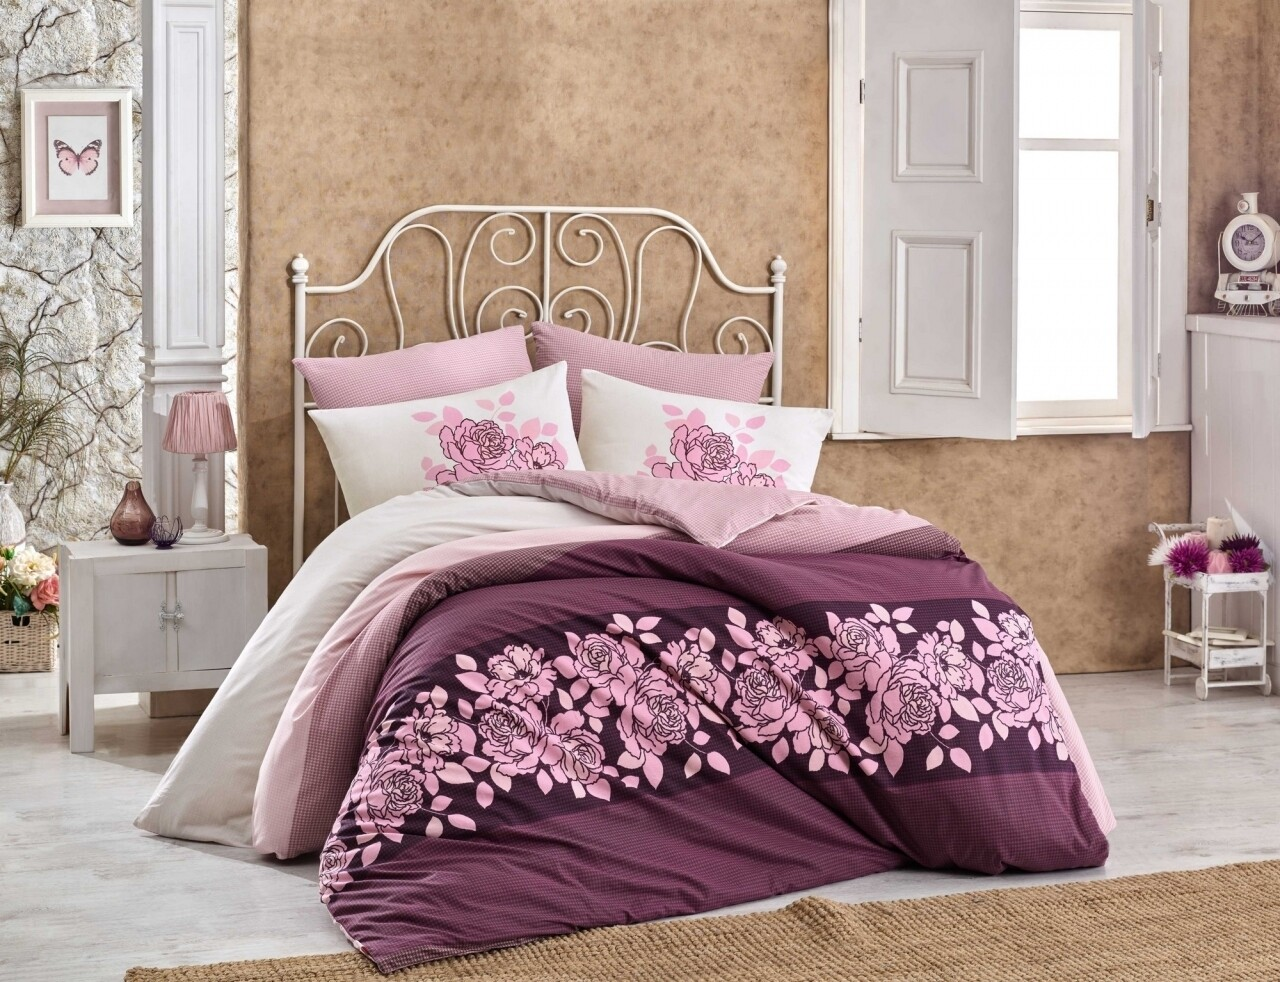 Lenjerie de pat pentru o persoana, 3 piese, 100% bumbac ranforce, Hobby, Martina Garnet, alb/roz